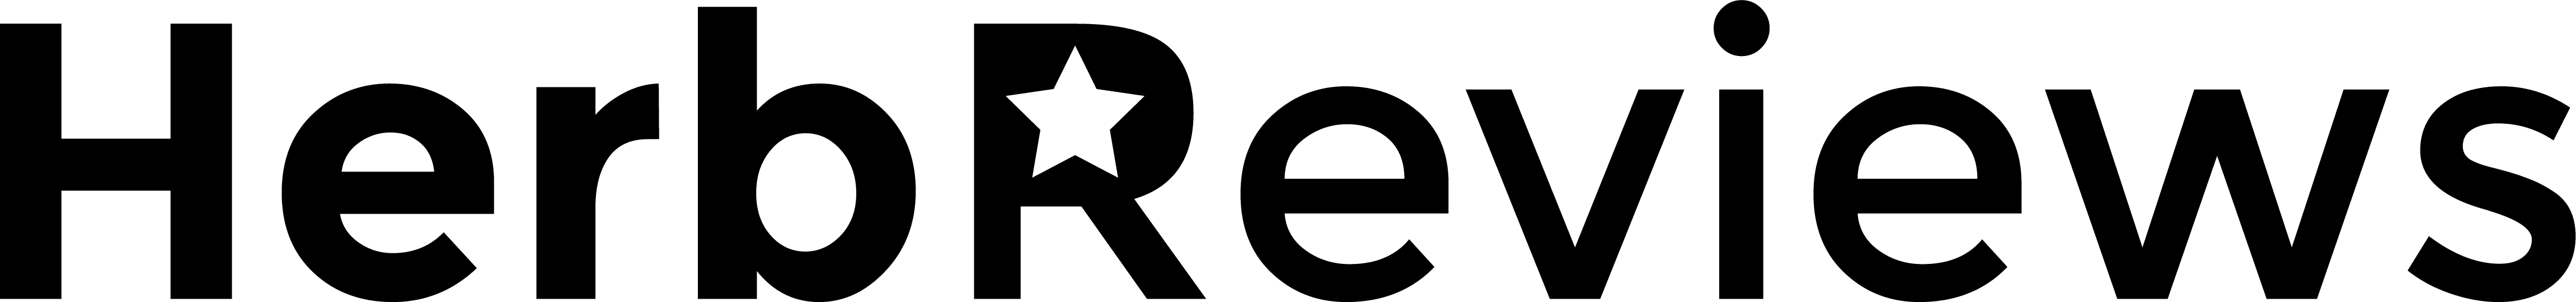 Herb Reviews logo